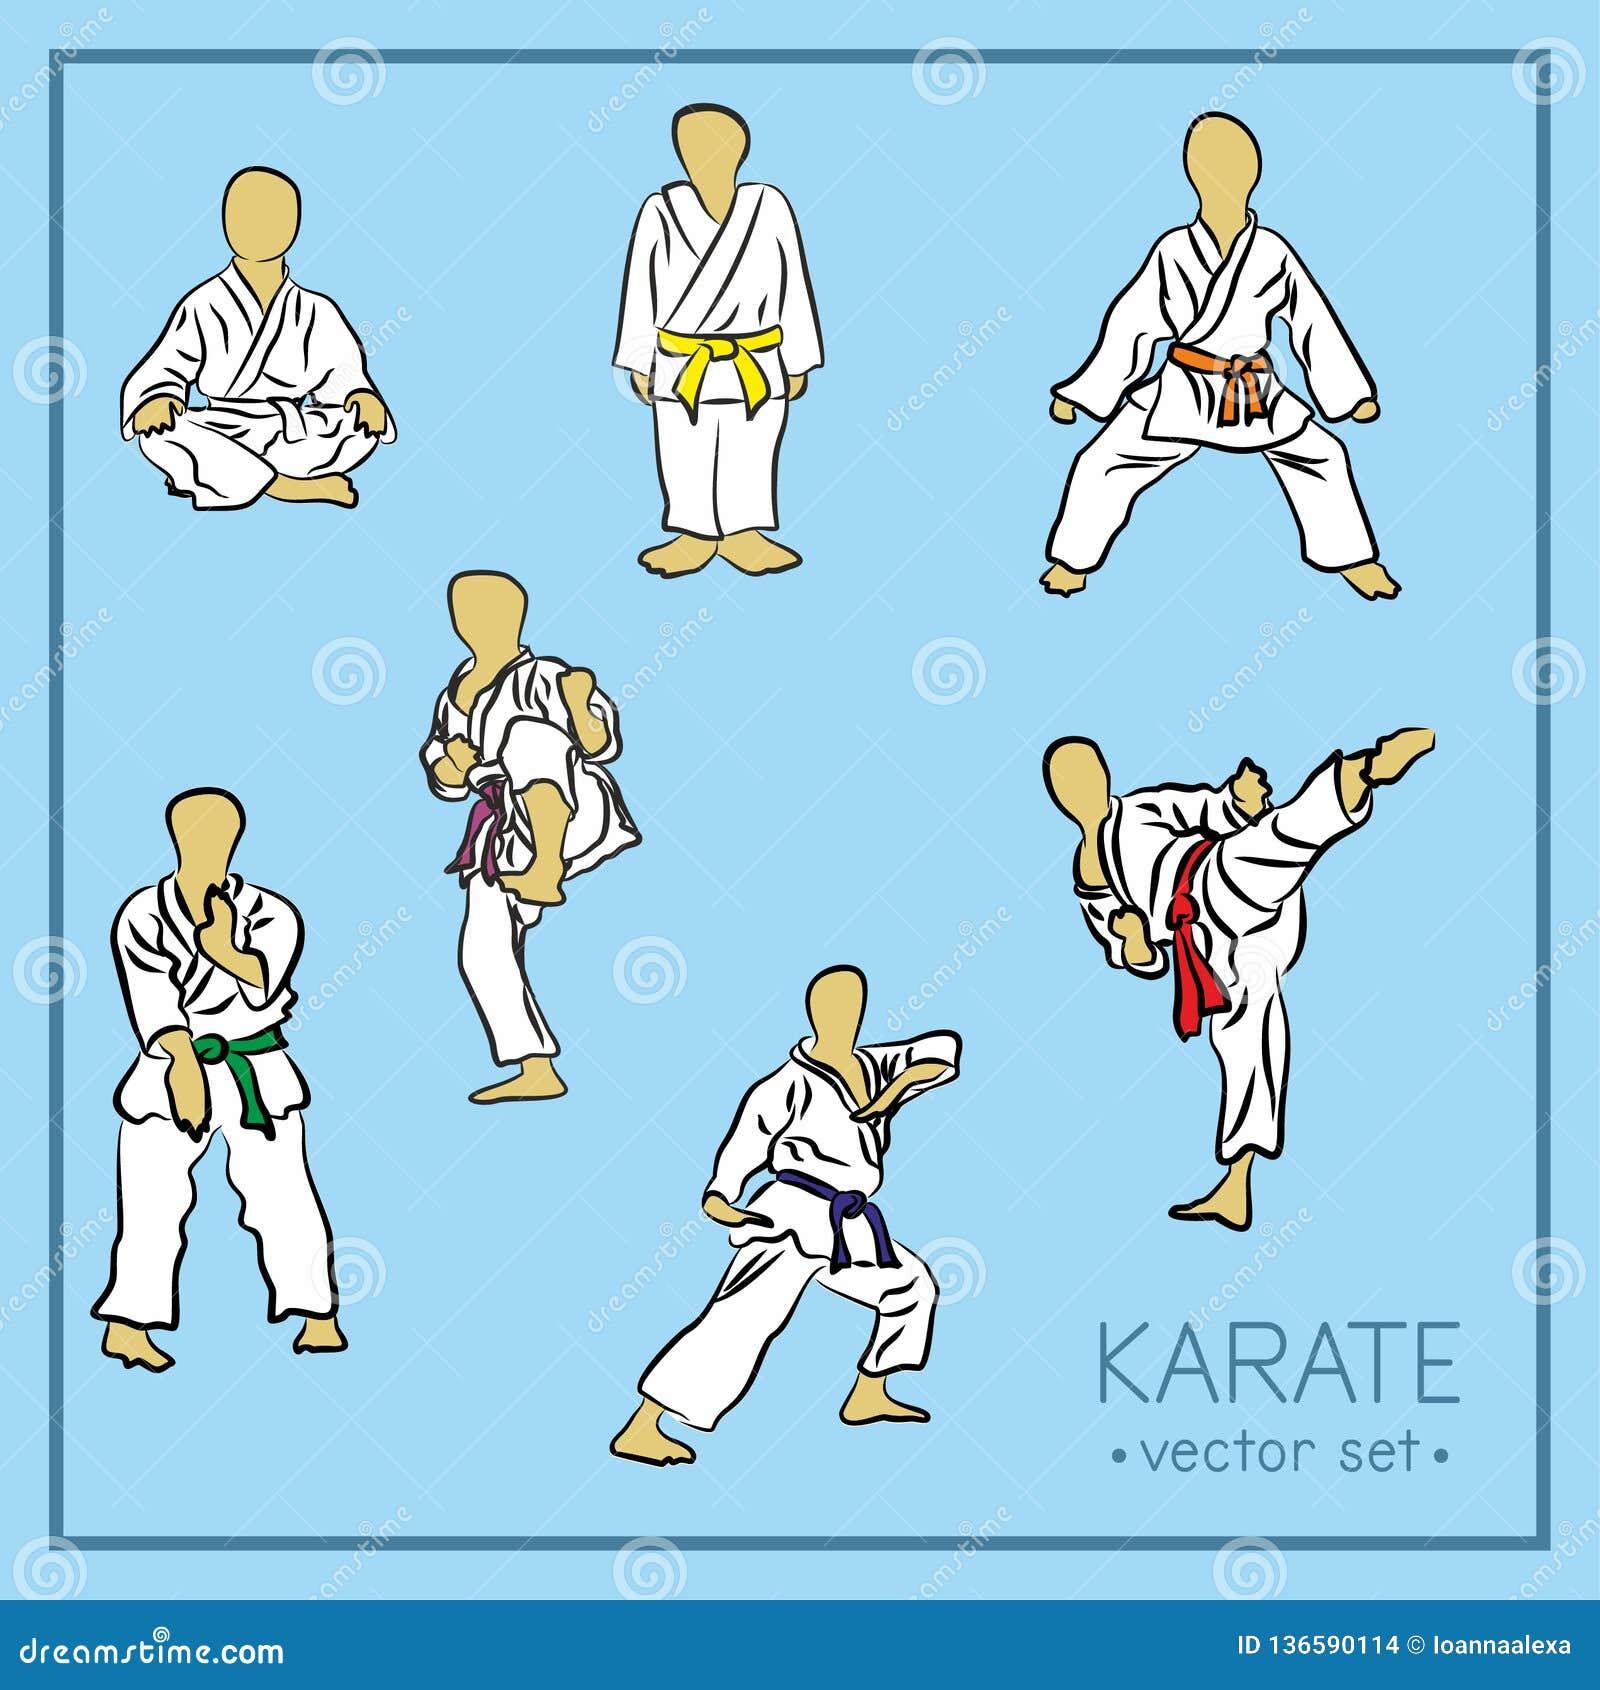 Karate Poses Stock Illustrations 142 Karate Poses Stock Illustrations Vectors Clipart Dreamstime